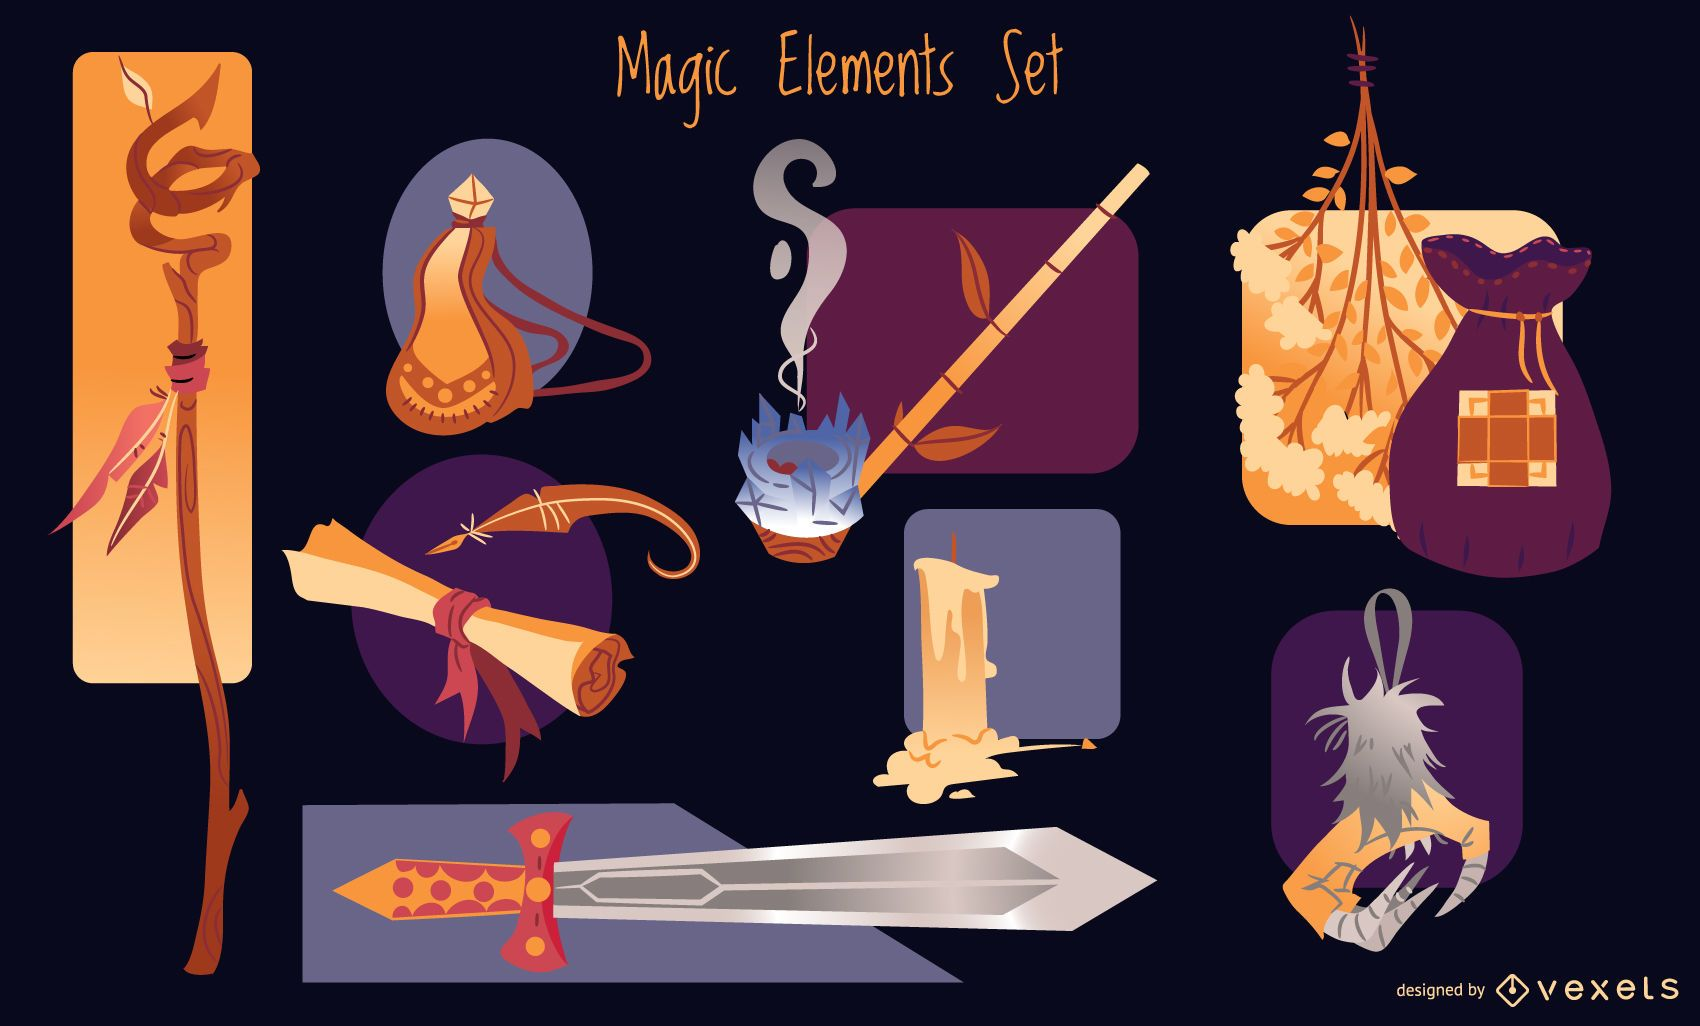 Magic elements set